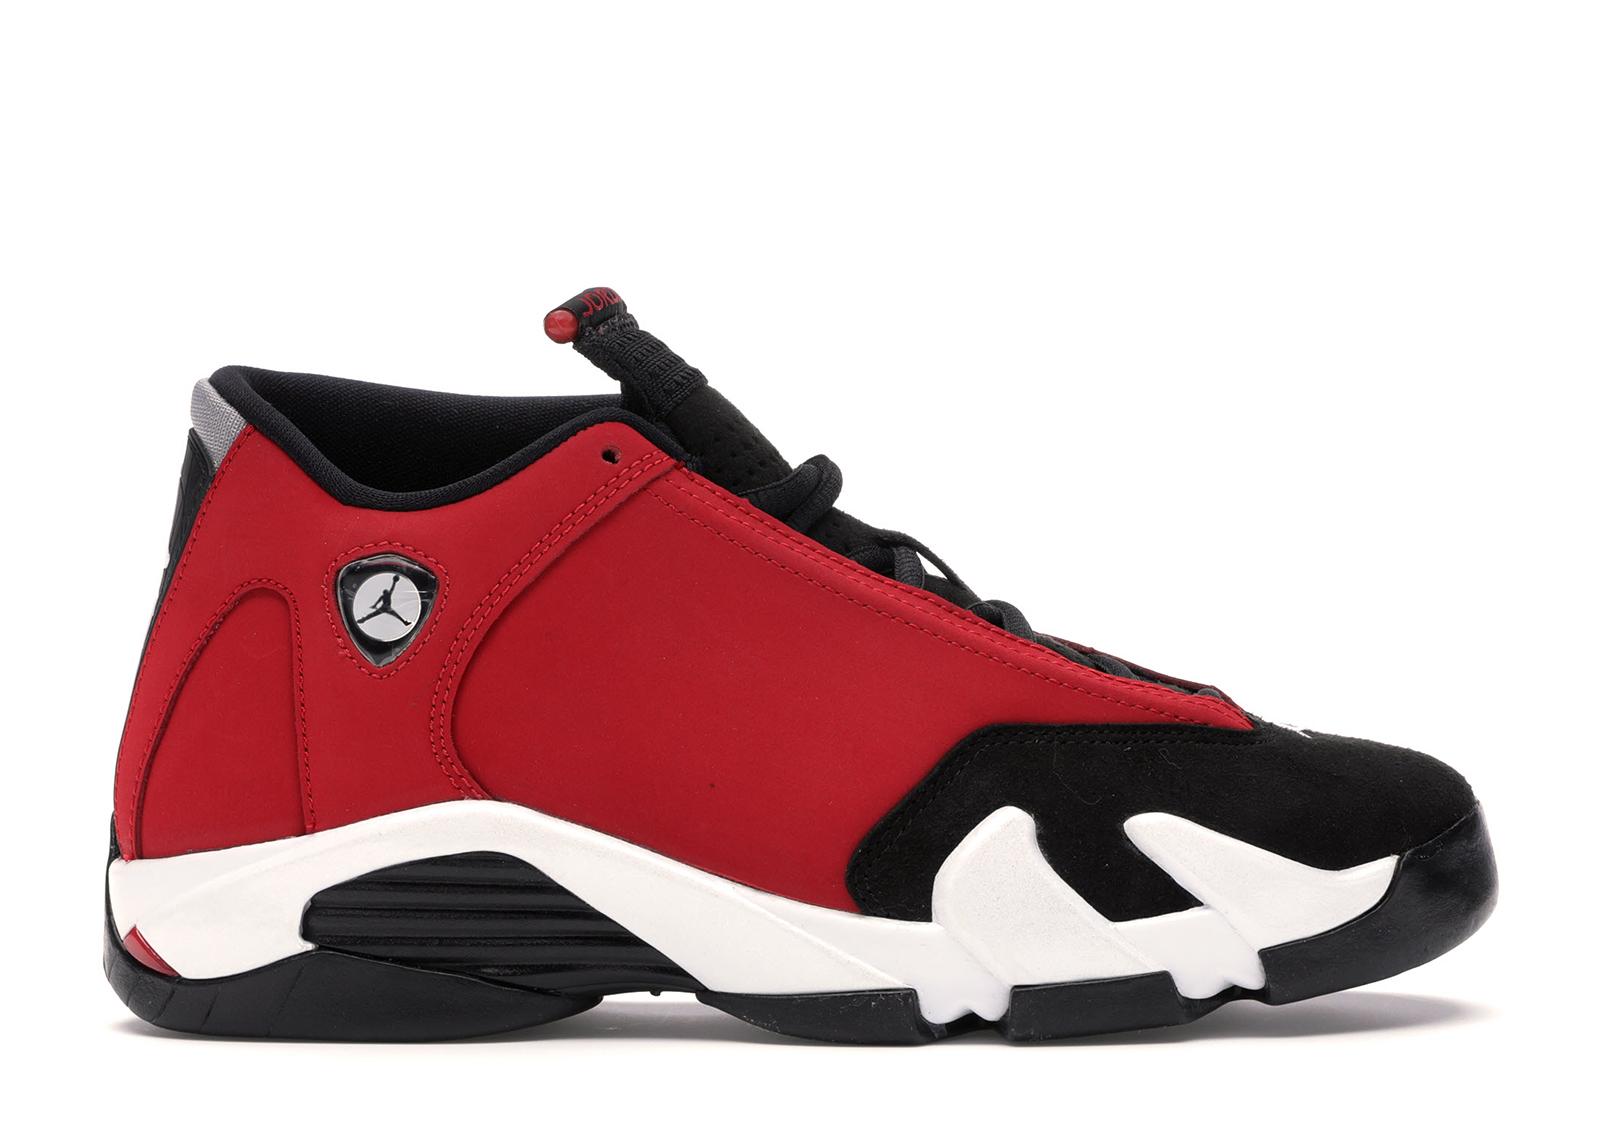 Jordan 14 Retro Gym Red Toro (GS